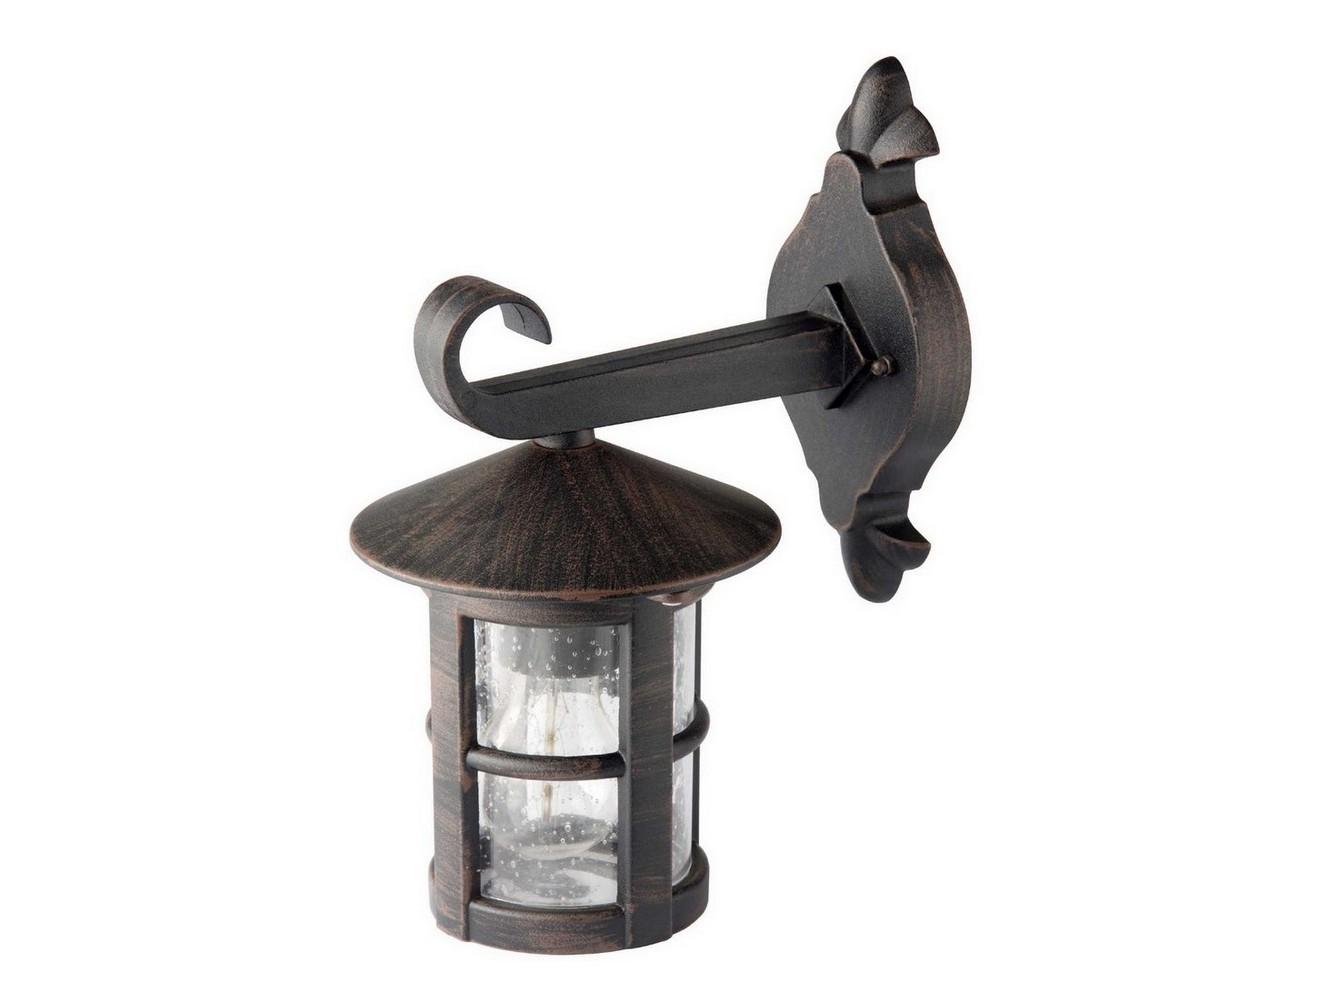 Светильник настенный JordyУличные настенные светильники<br>&amp;lt;div&amp;gt;Вид цоколя: Е27&amp;lt;/div&amp;gt;&amp;lt;div&amp;gt;Мощность лампы: 60W&amp;lt;/div&amp;gt;&amp;lt;div&amp;gt;Количество ламп: 1&amp;lt;/div&amp;gt;&amp;lt;div&amp;gt;Наличие ламп: нет&amp;lt;/div&amp;gt;<br><br>Material: Стекло<br>Ширина см: 15<br>Высота см: 30<br>Глубина см: 23